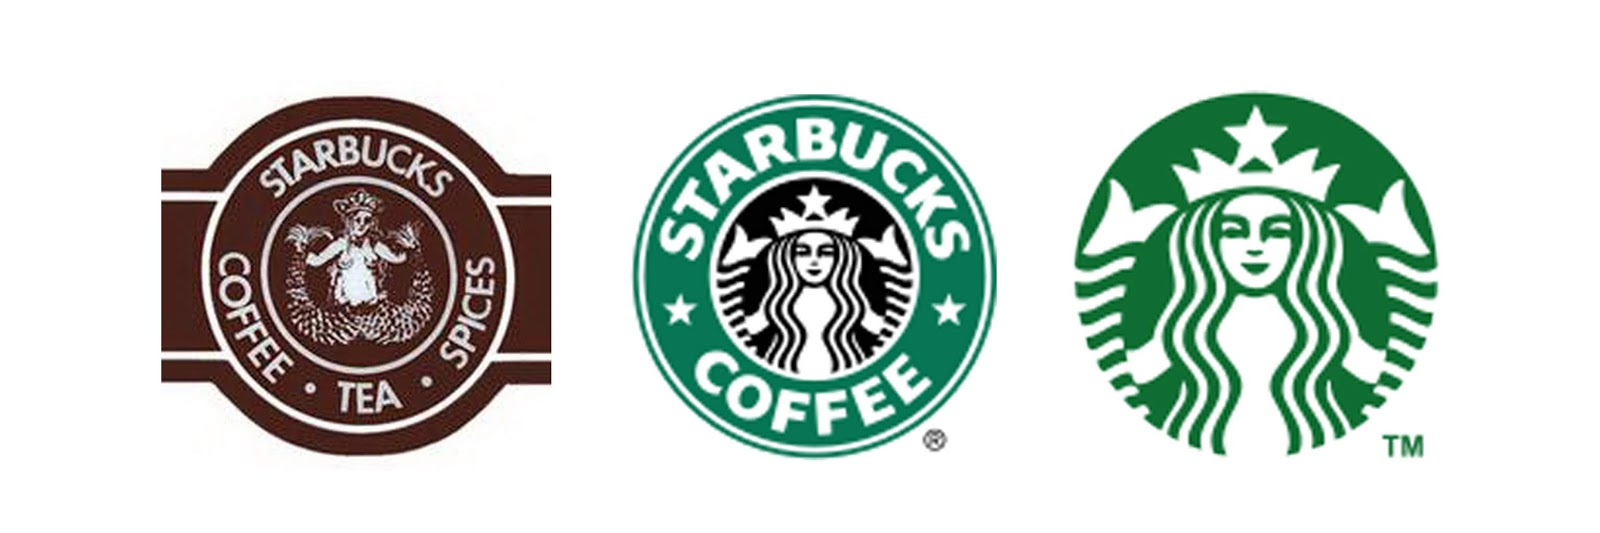 Perubahan logo starbucks